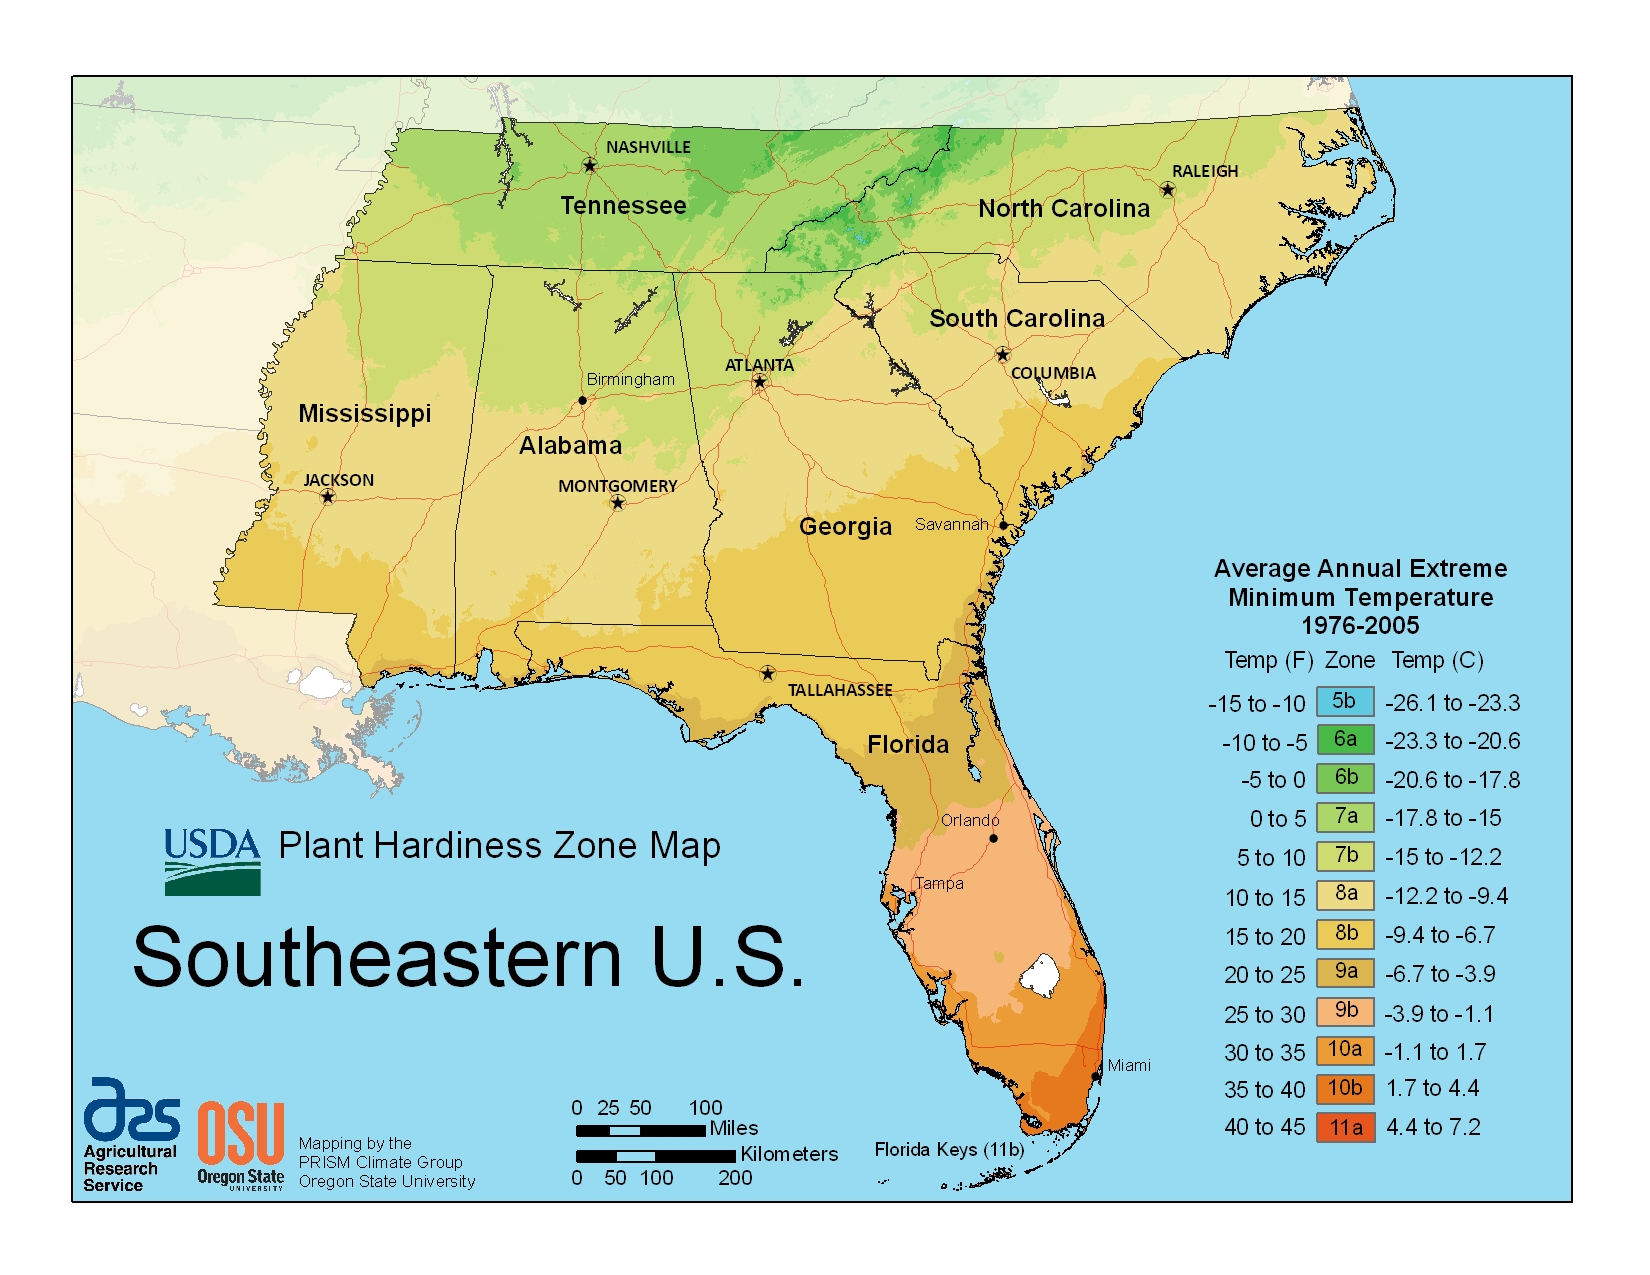 2012 Plant Hardiness Zone Map - Backyard Getaway - Plant Zone Map Florida